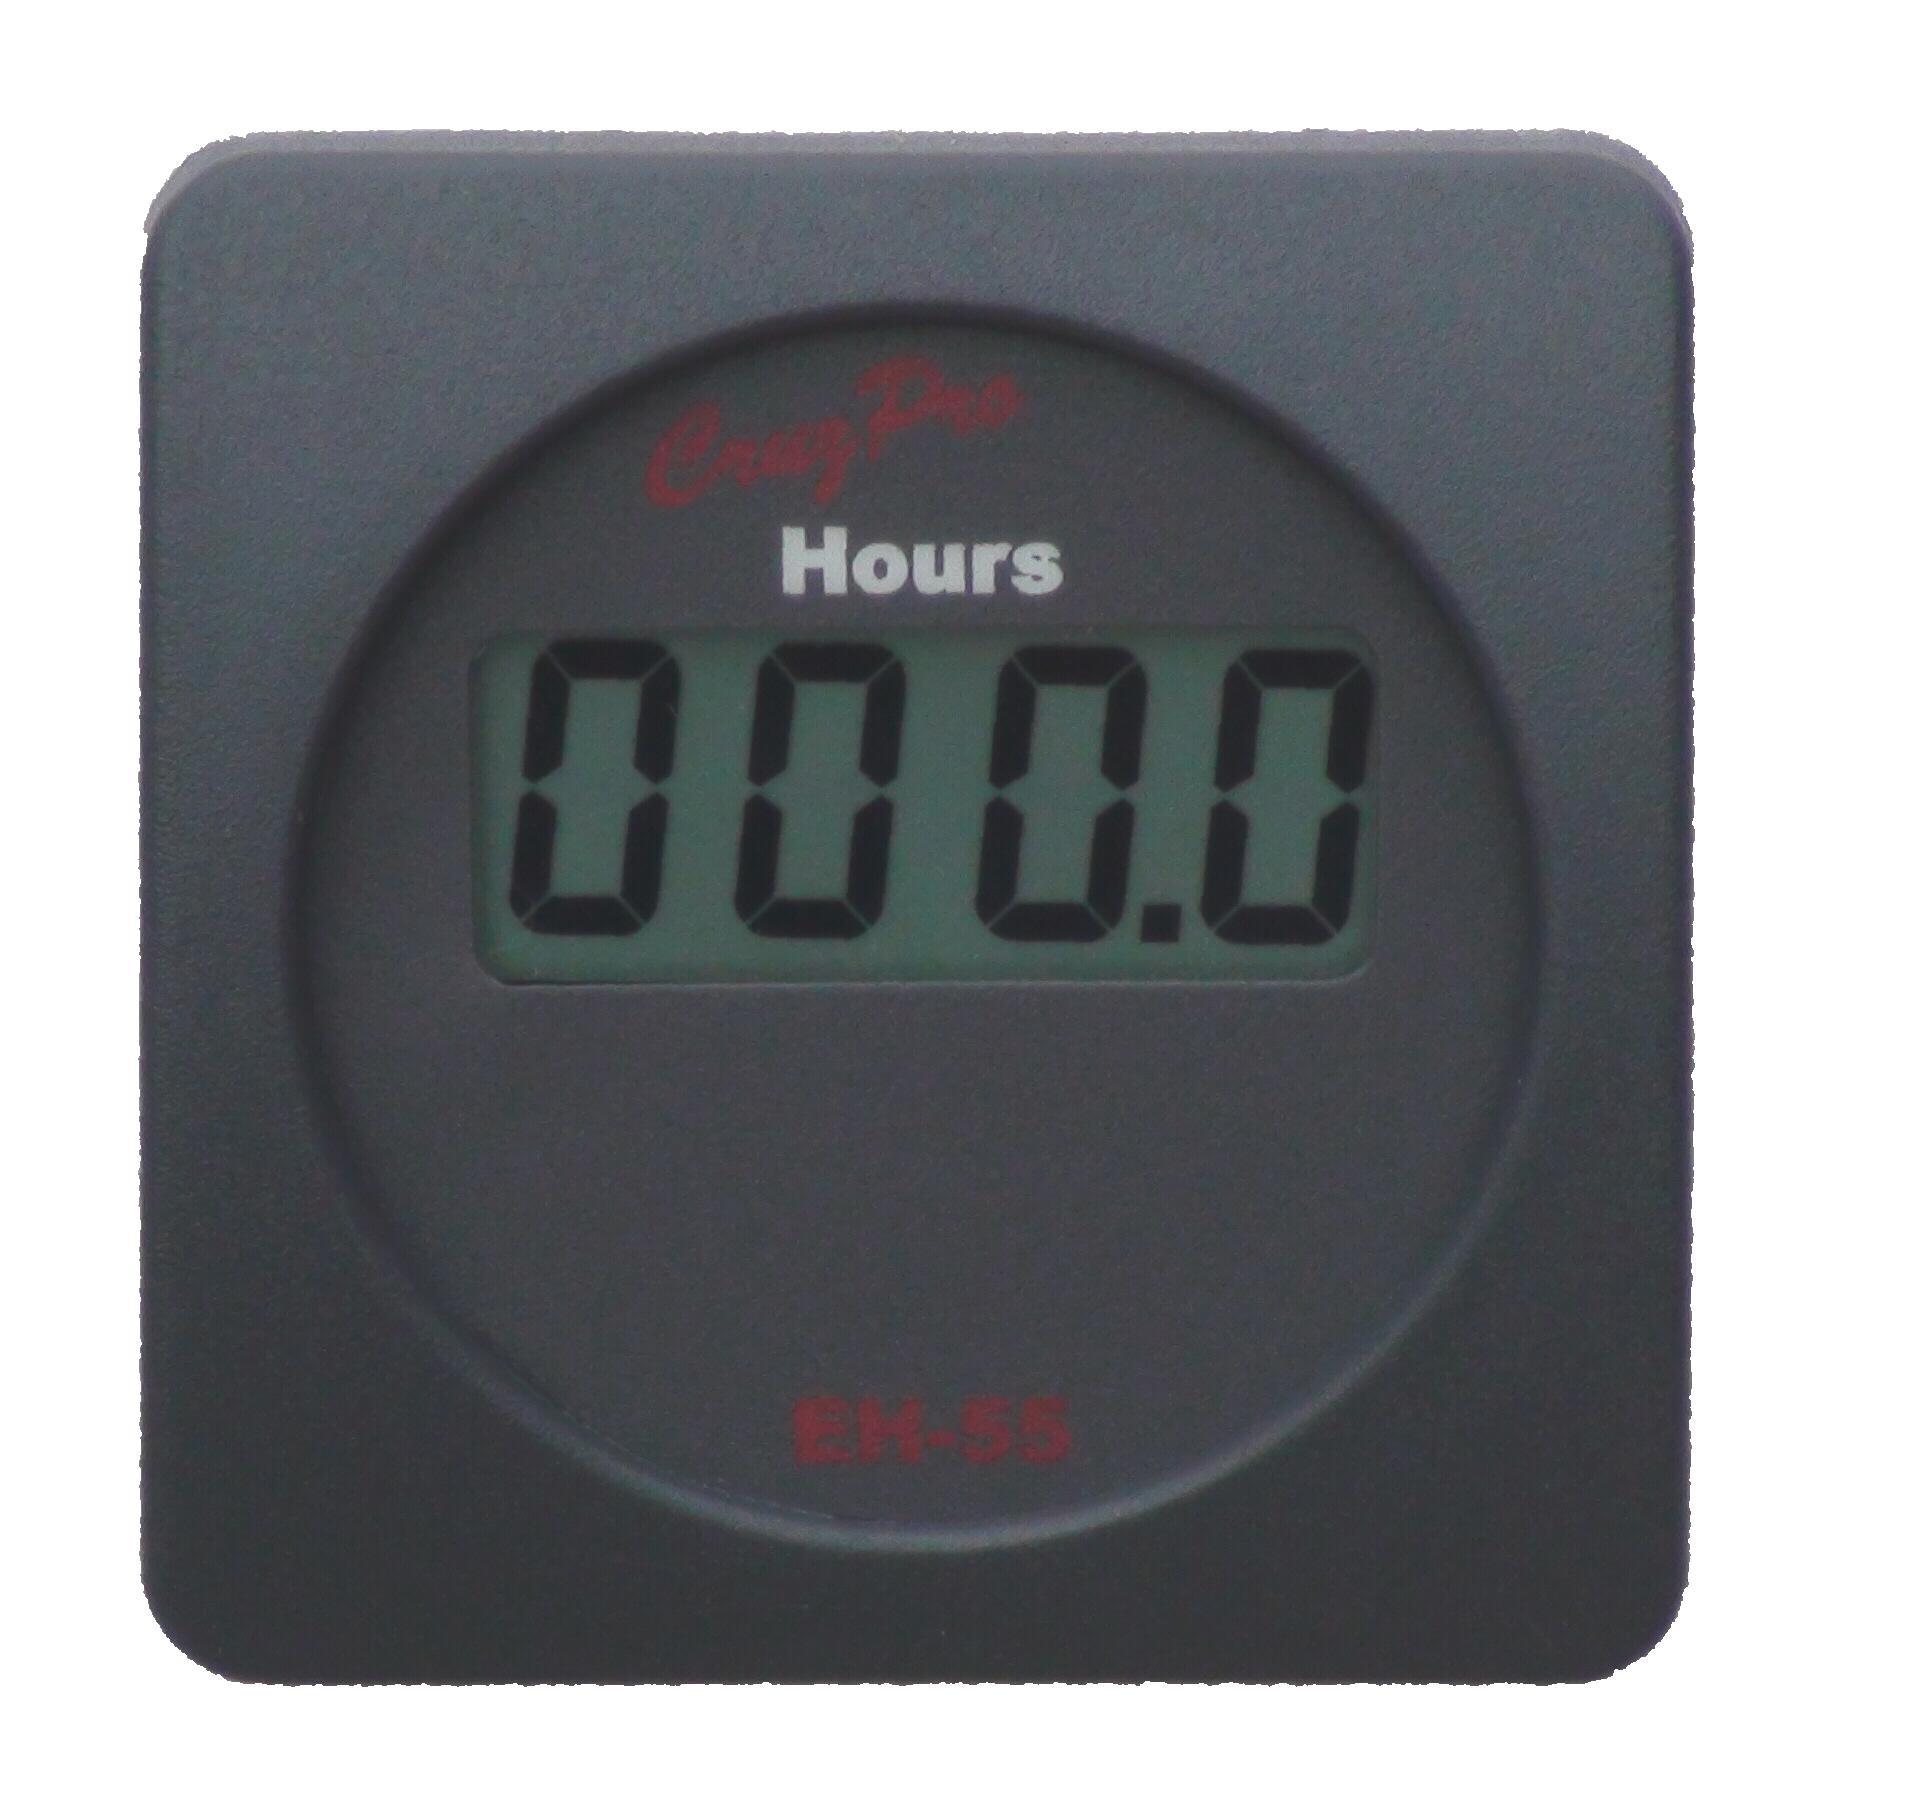 cruzpro eh55 simple digital engine hours and elapsed time gauge rh cruzpro com